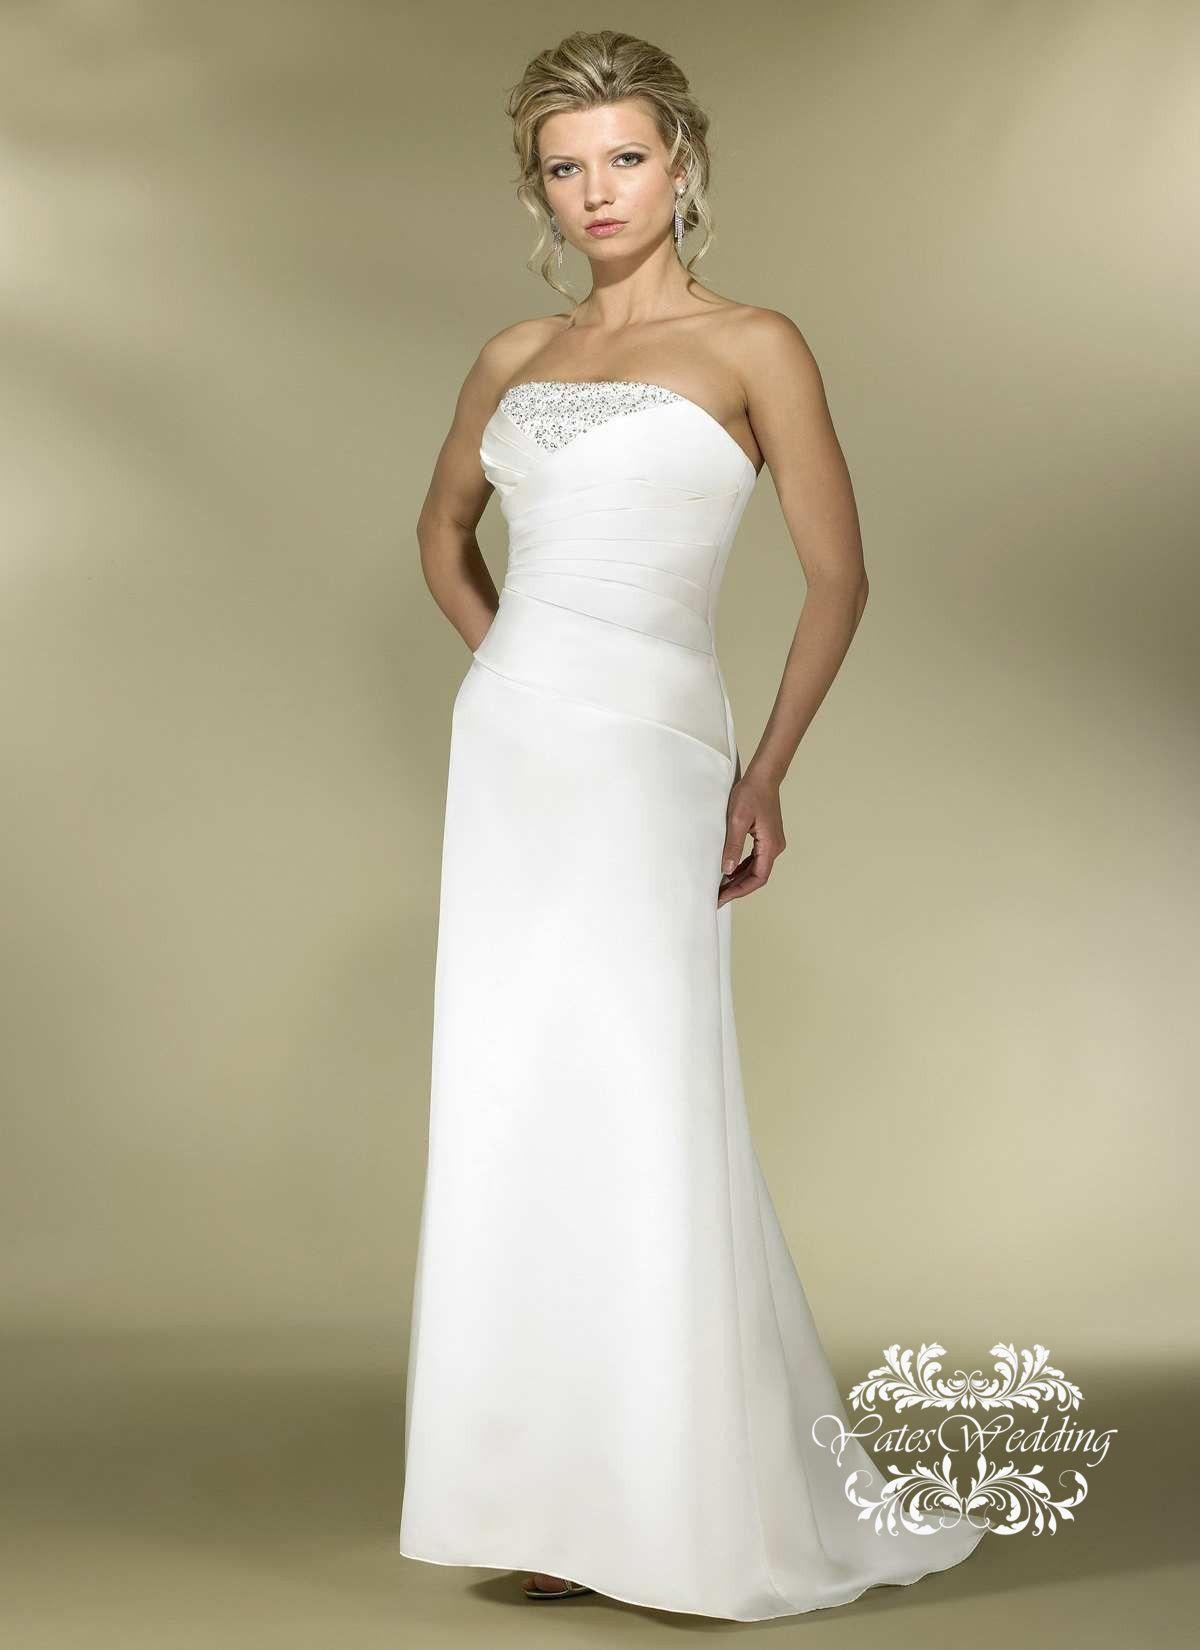 Jcpenney Wedding Dresses Catalog Find Your Favorite Popular Wedding Dresses Jcpenney Wedding Dresses Wedding Dress Outlet